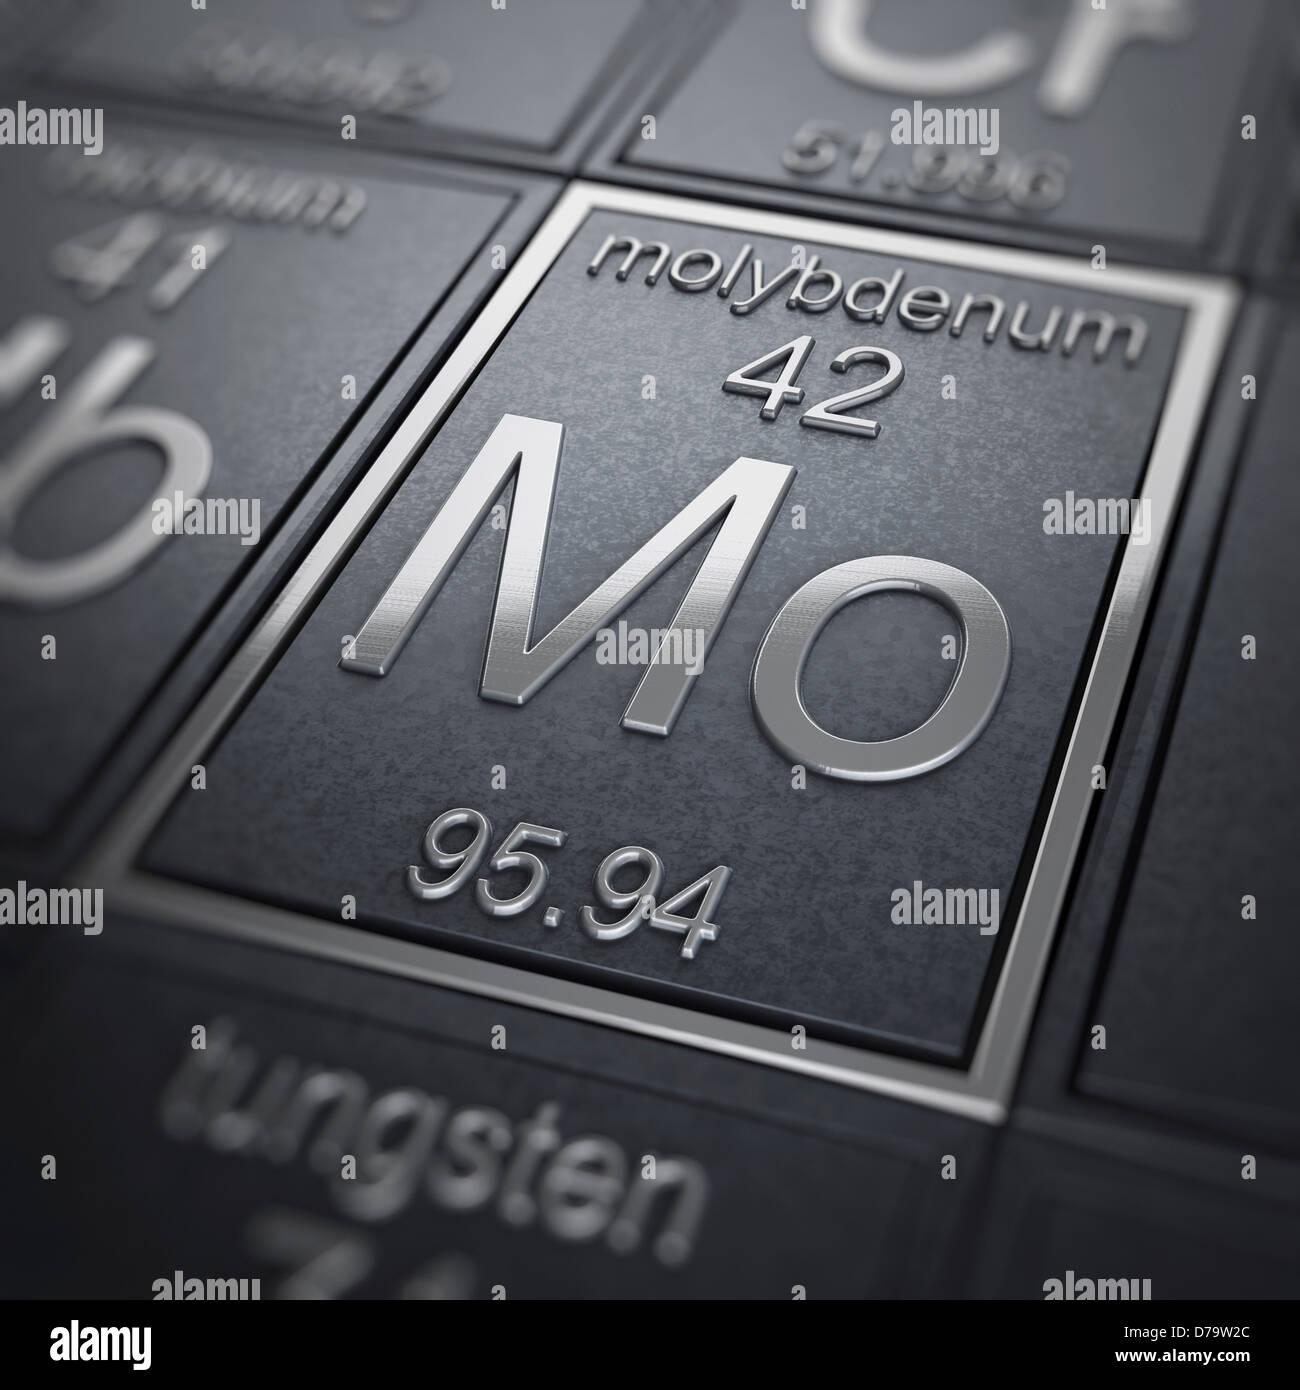 Molybdenum Chemical Element Stock Photo 56150932 Alamy